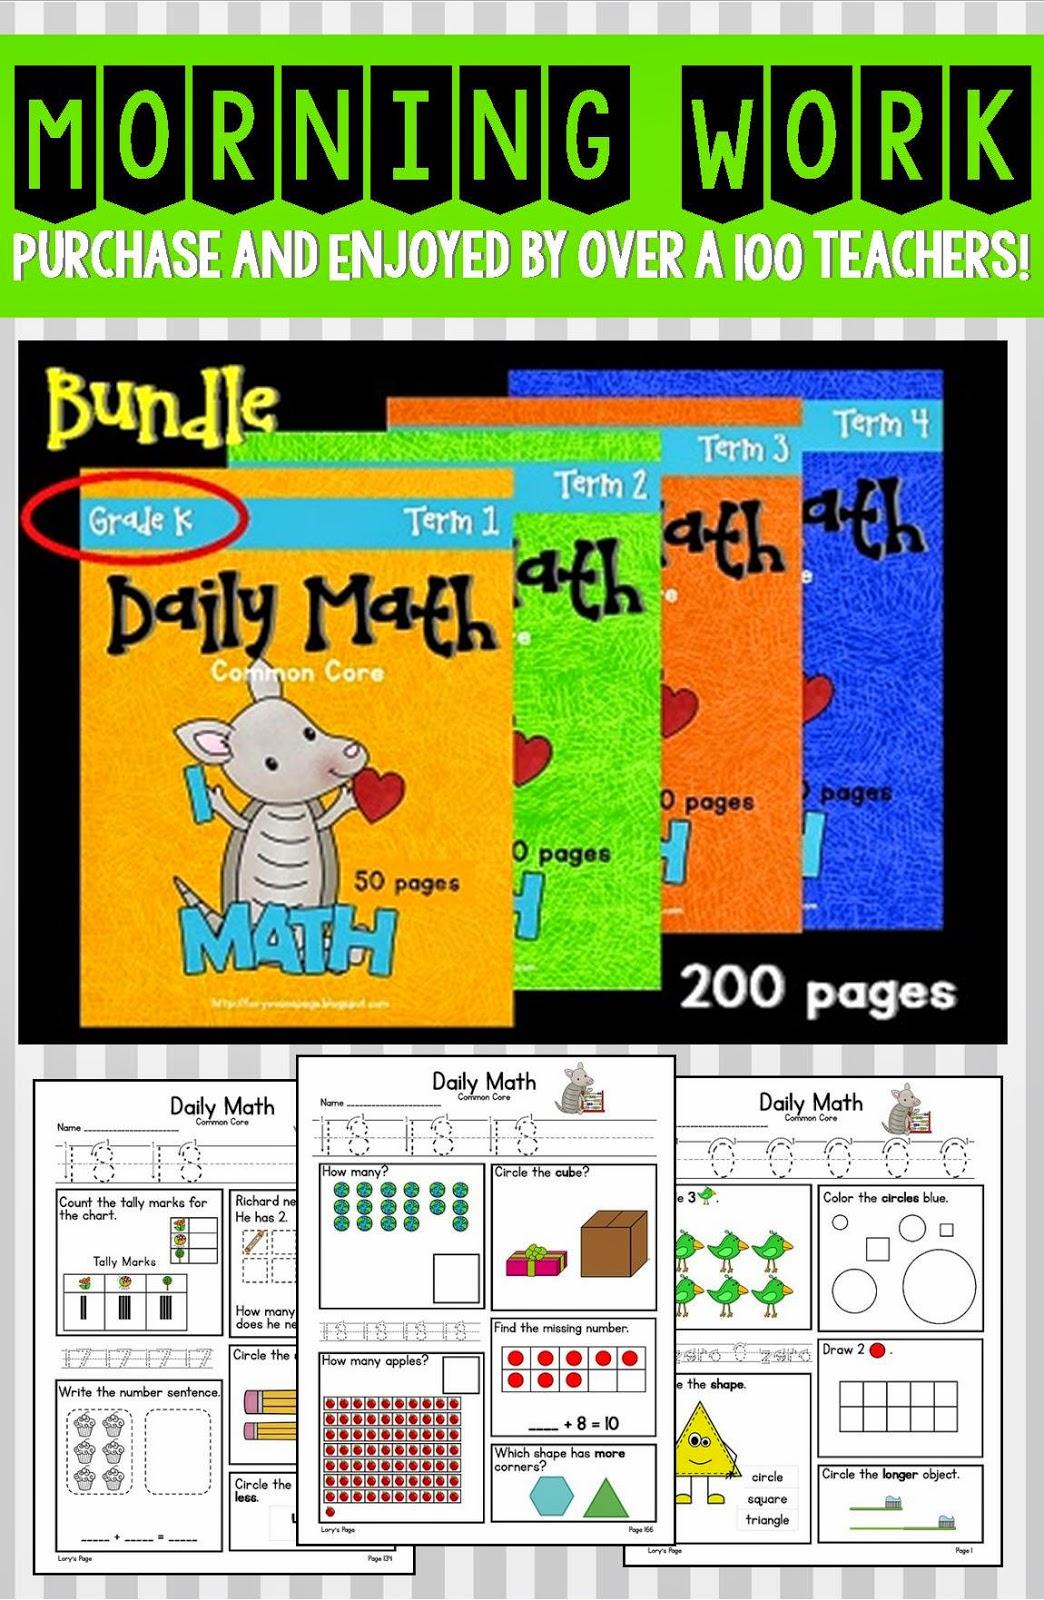 Lory S 2nd Grade Skills Daily Math Kindergarten